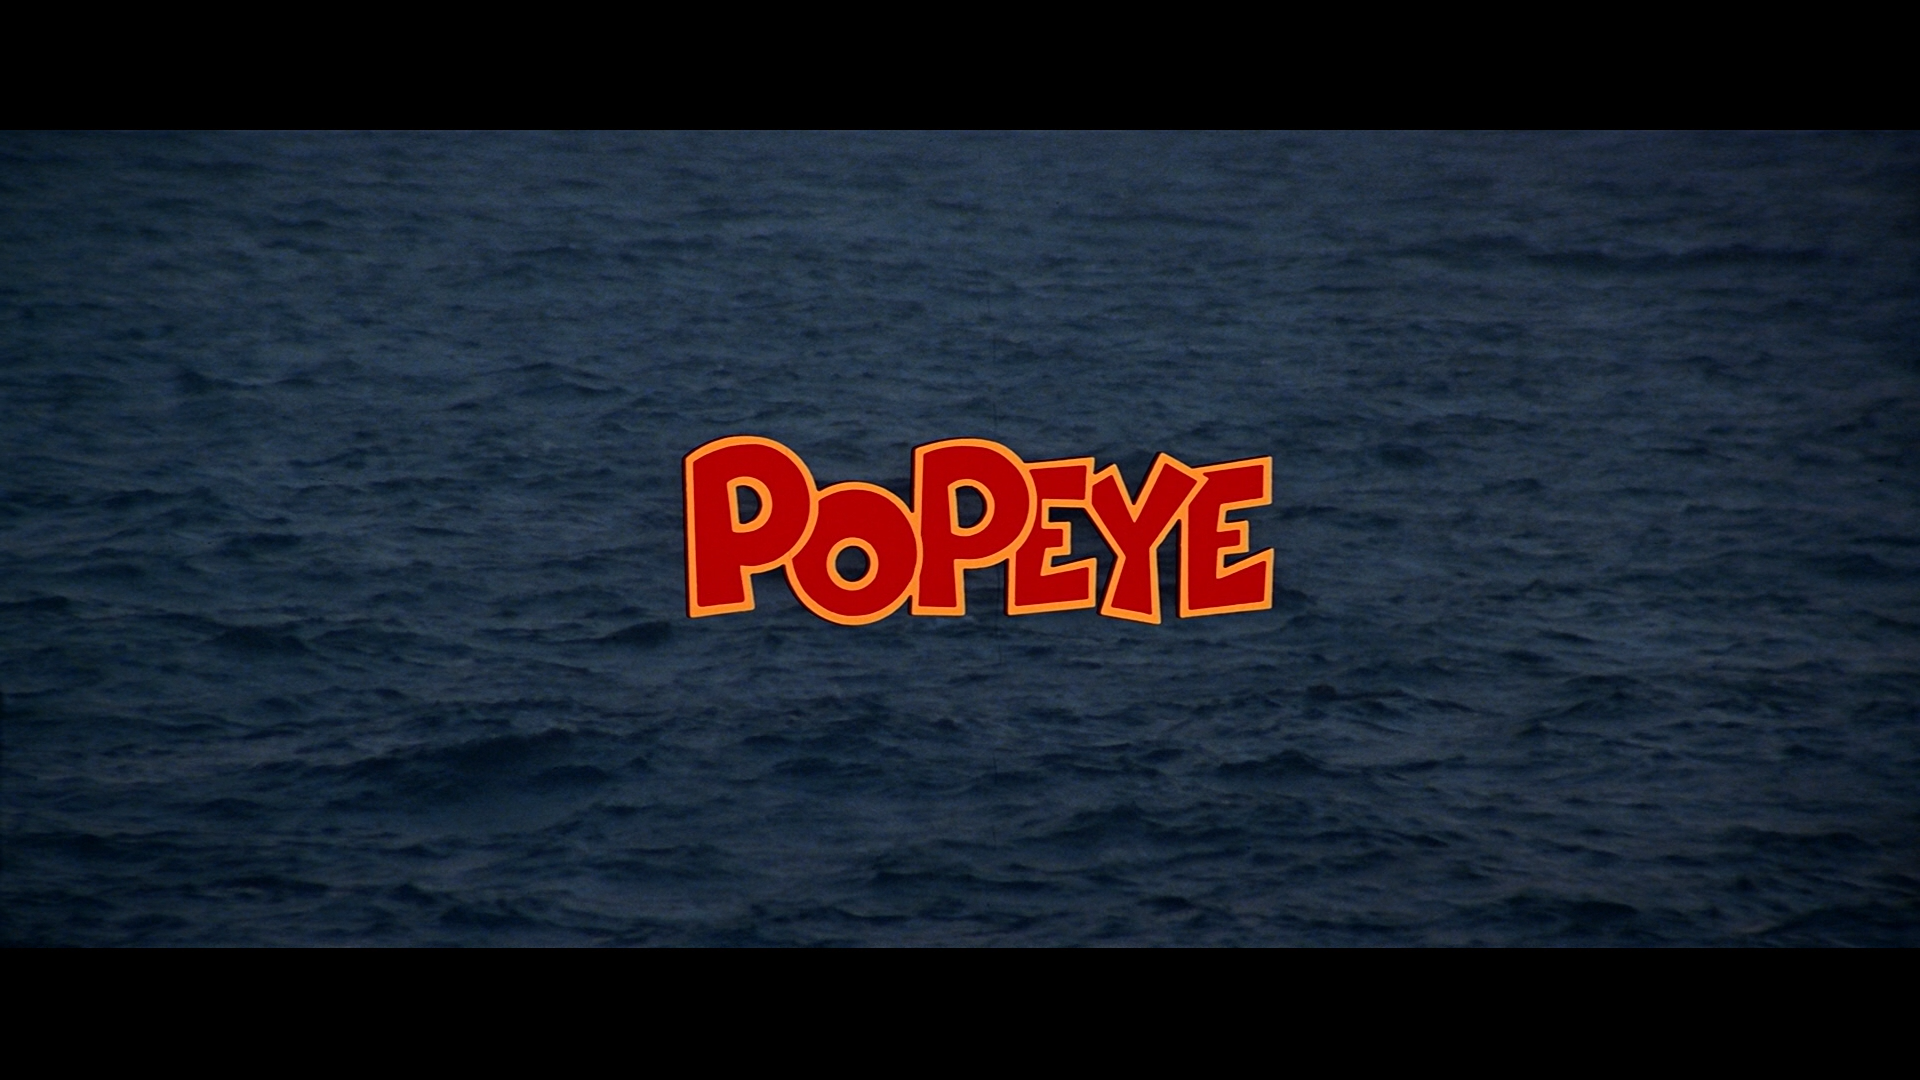 popeye title